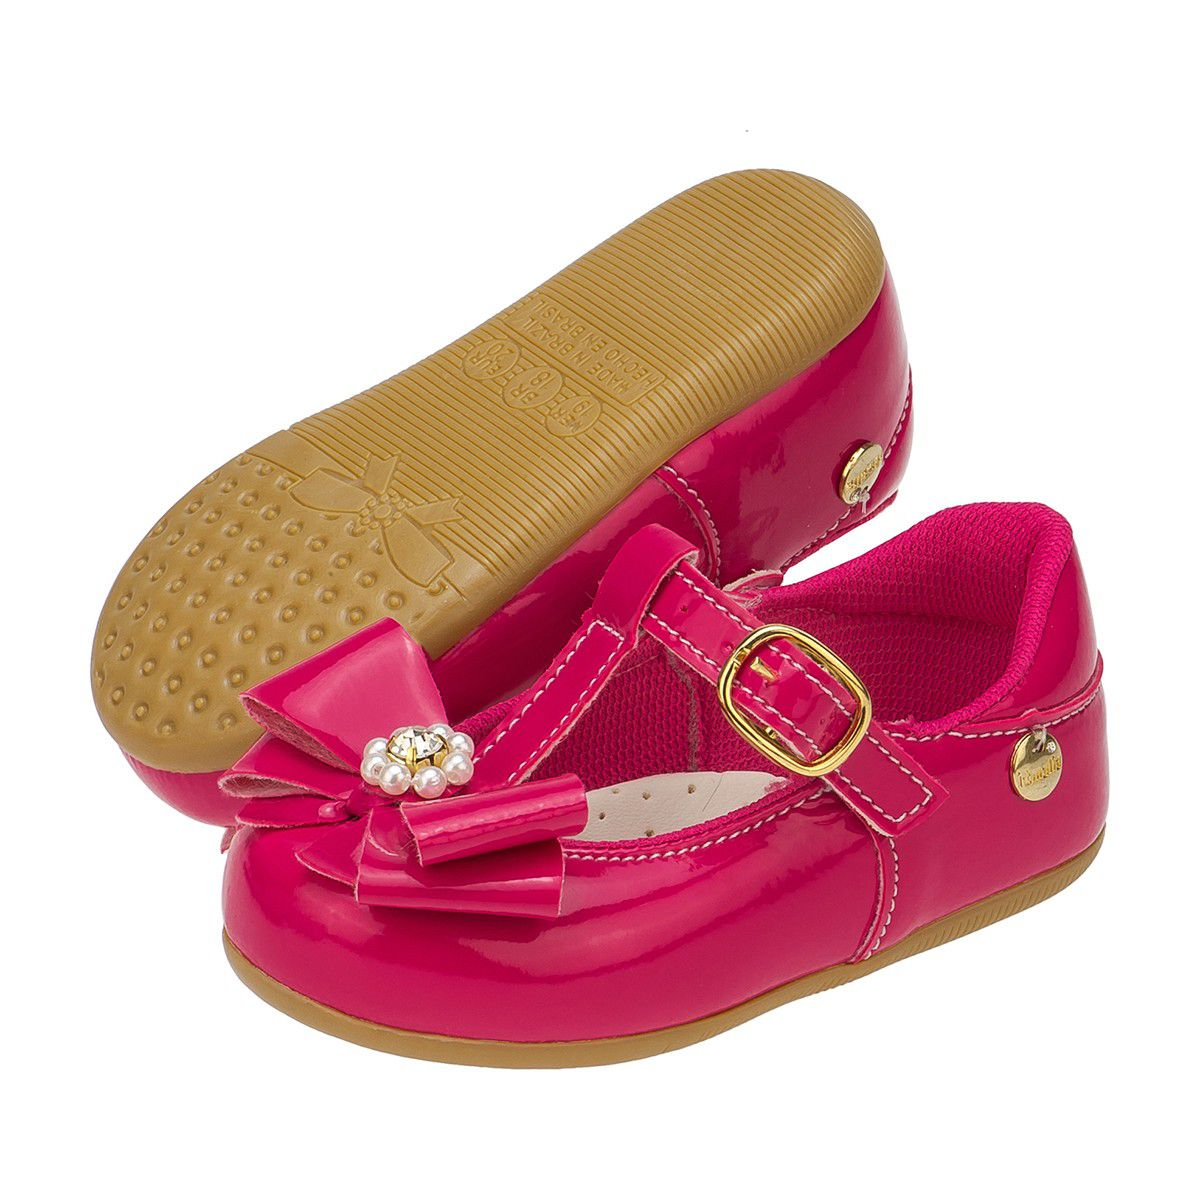 Sapatilha Kids Menina Laço com Perolas Pink - Itmalia